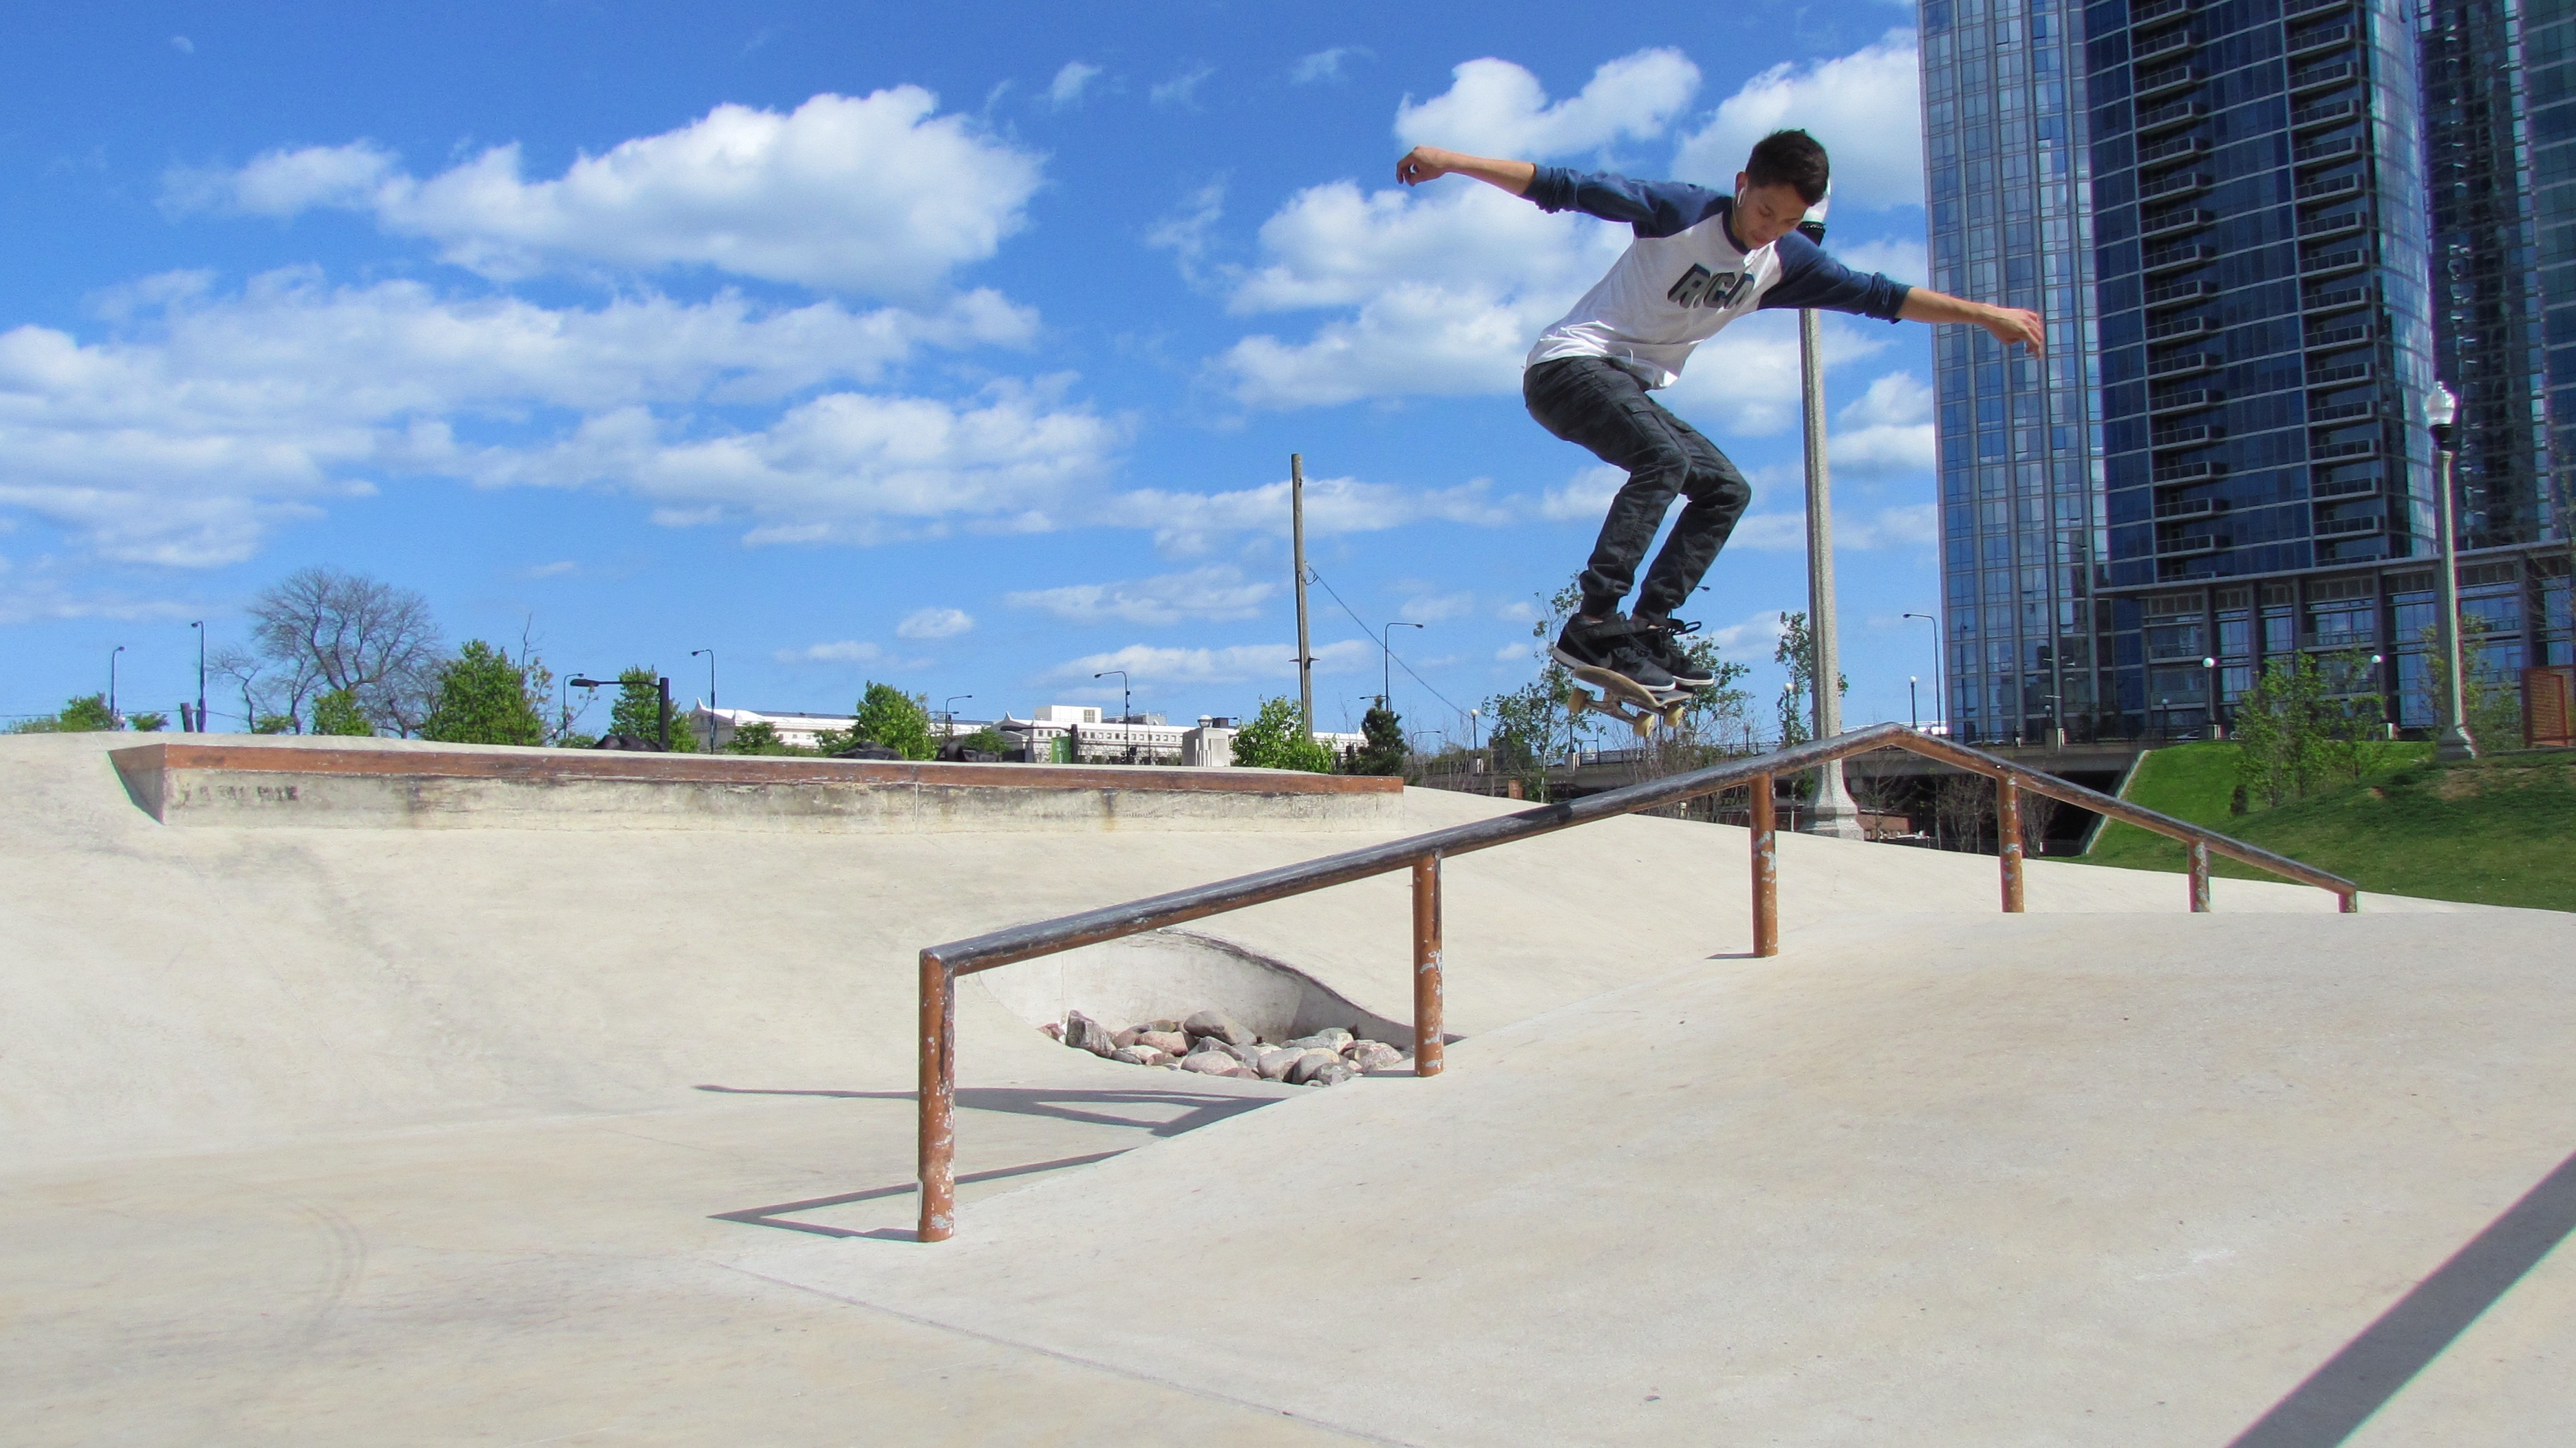 Grant Park Skate Park - 2